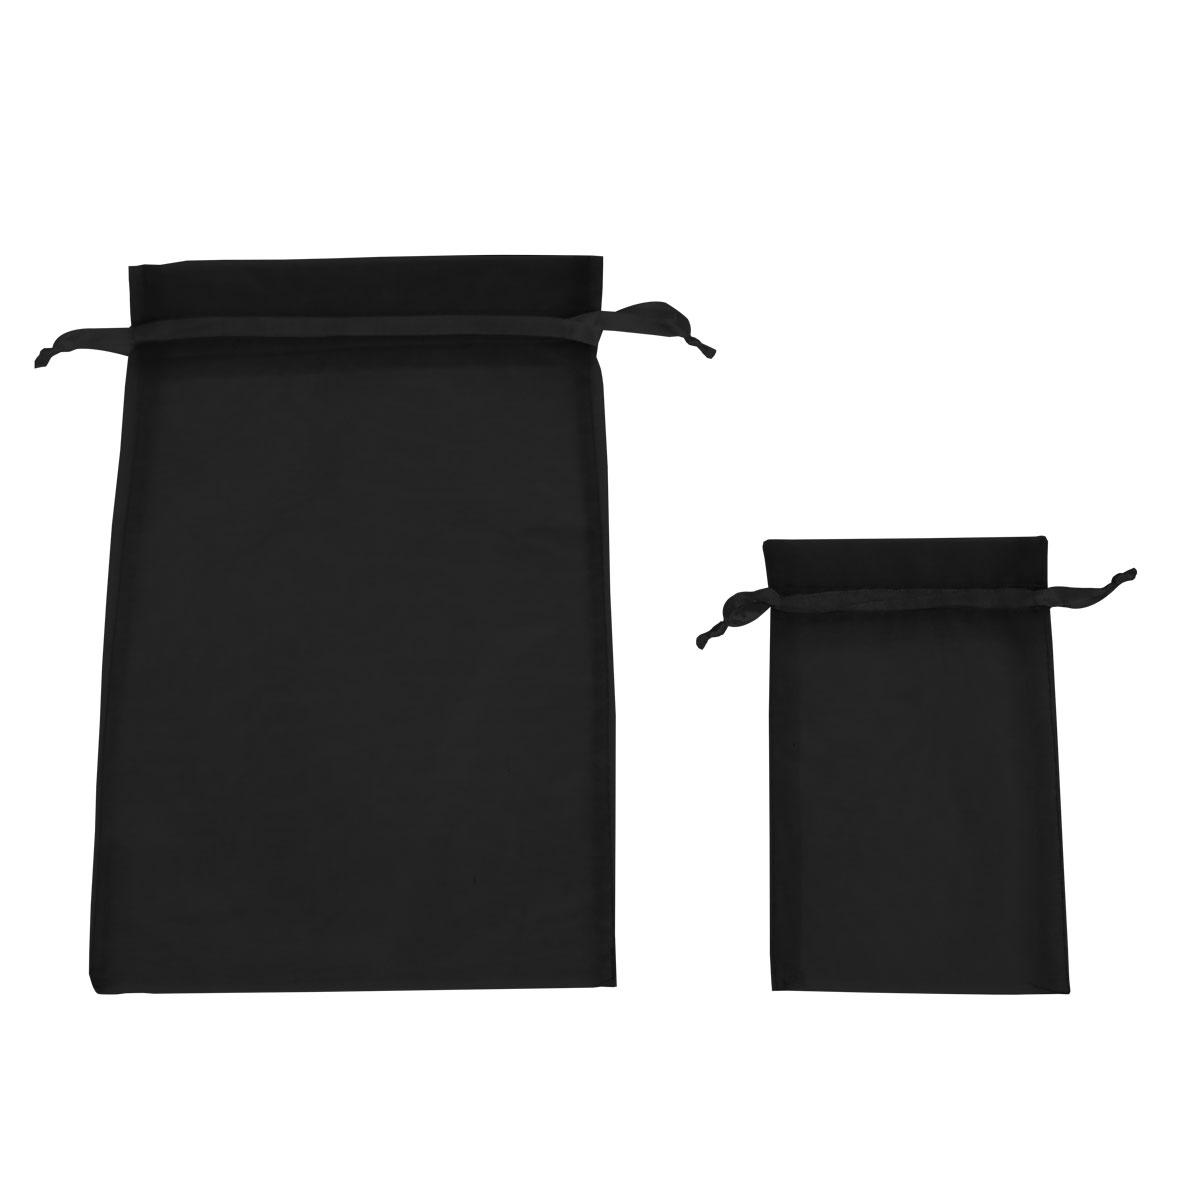 organzazakjes-zwart-product_(1)